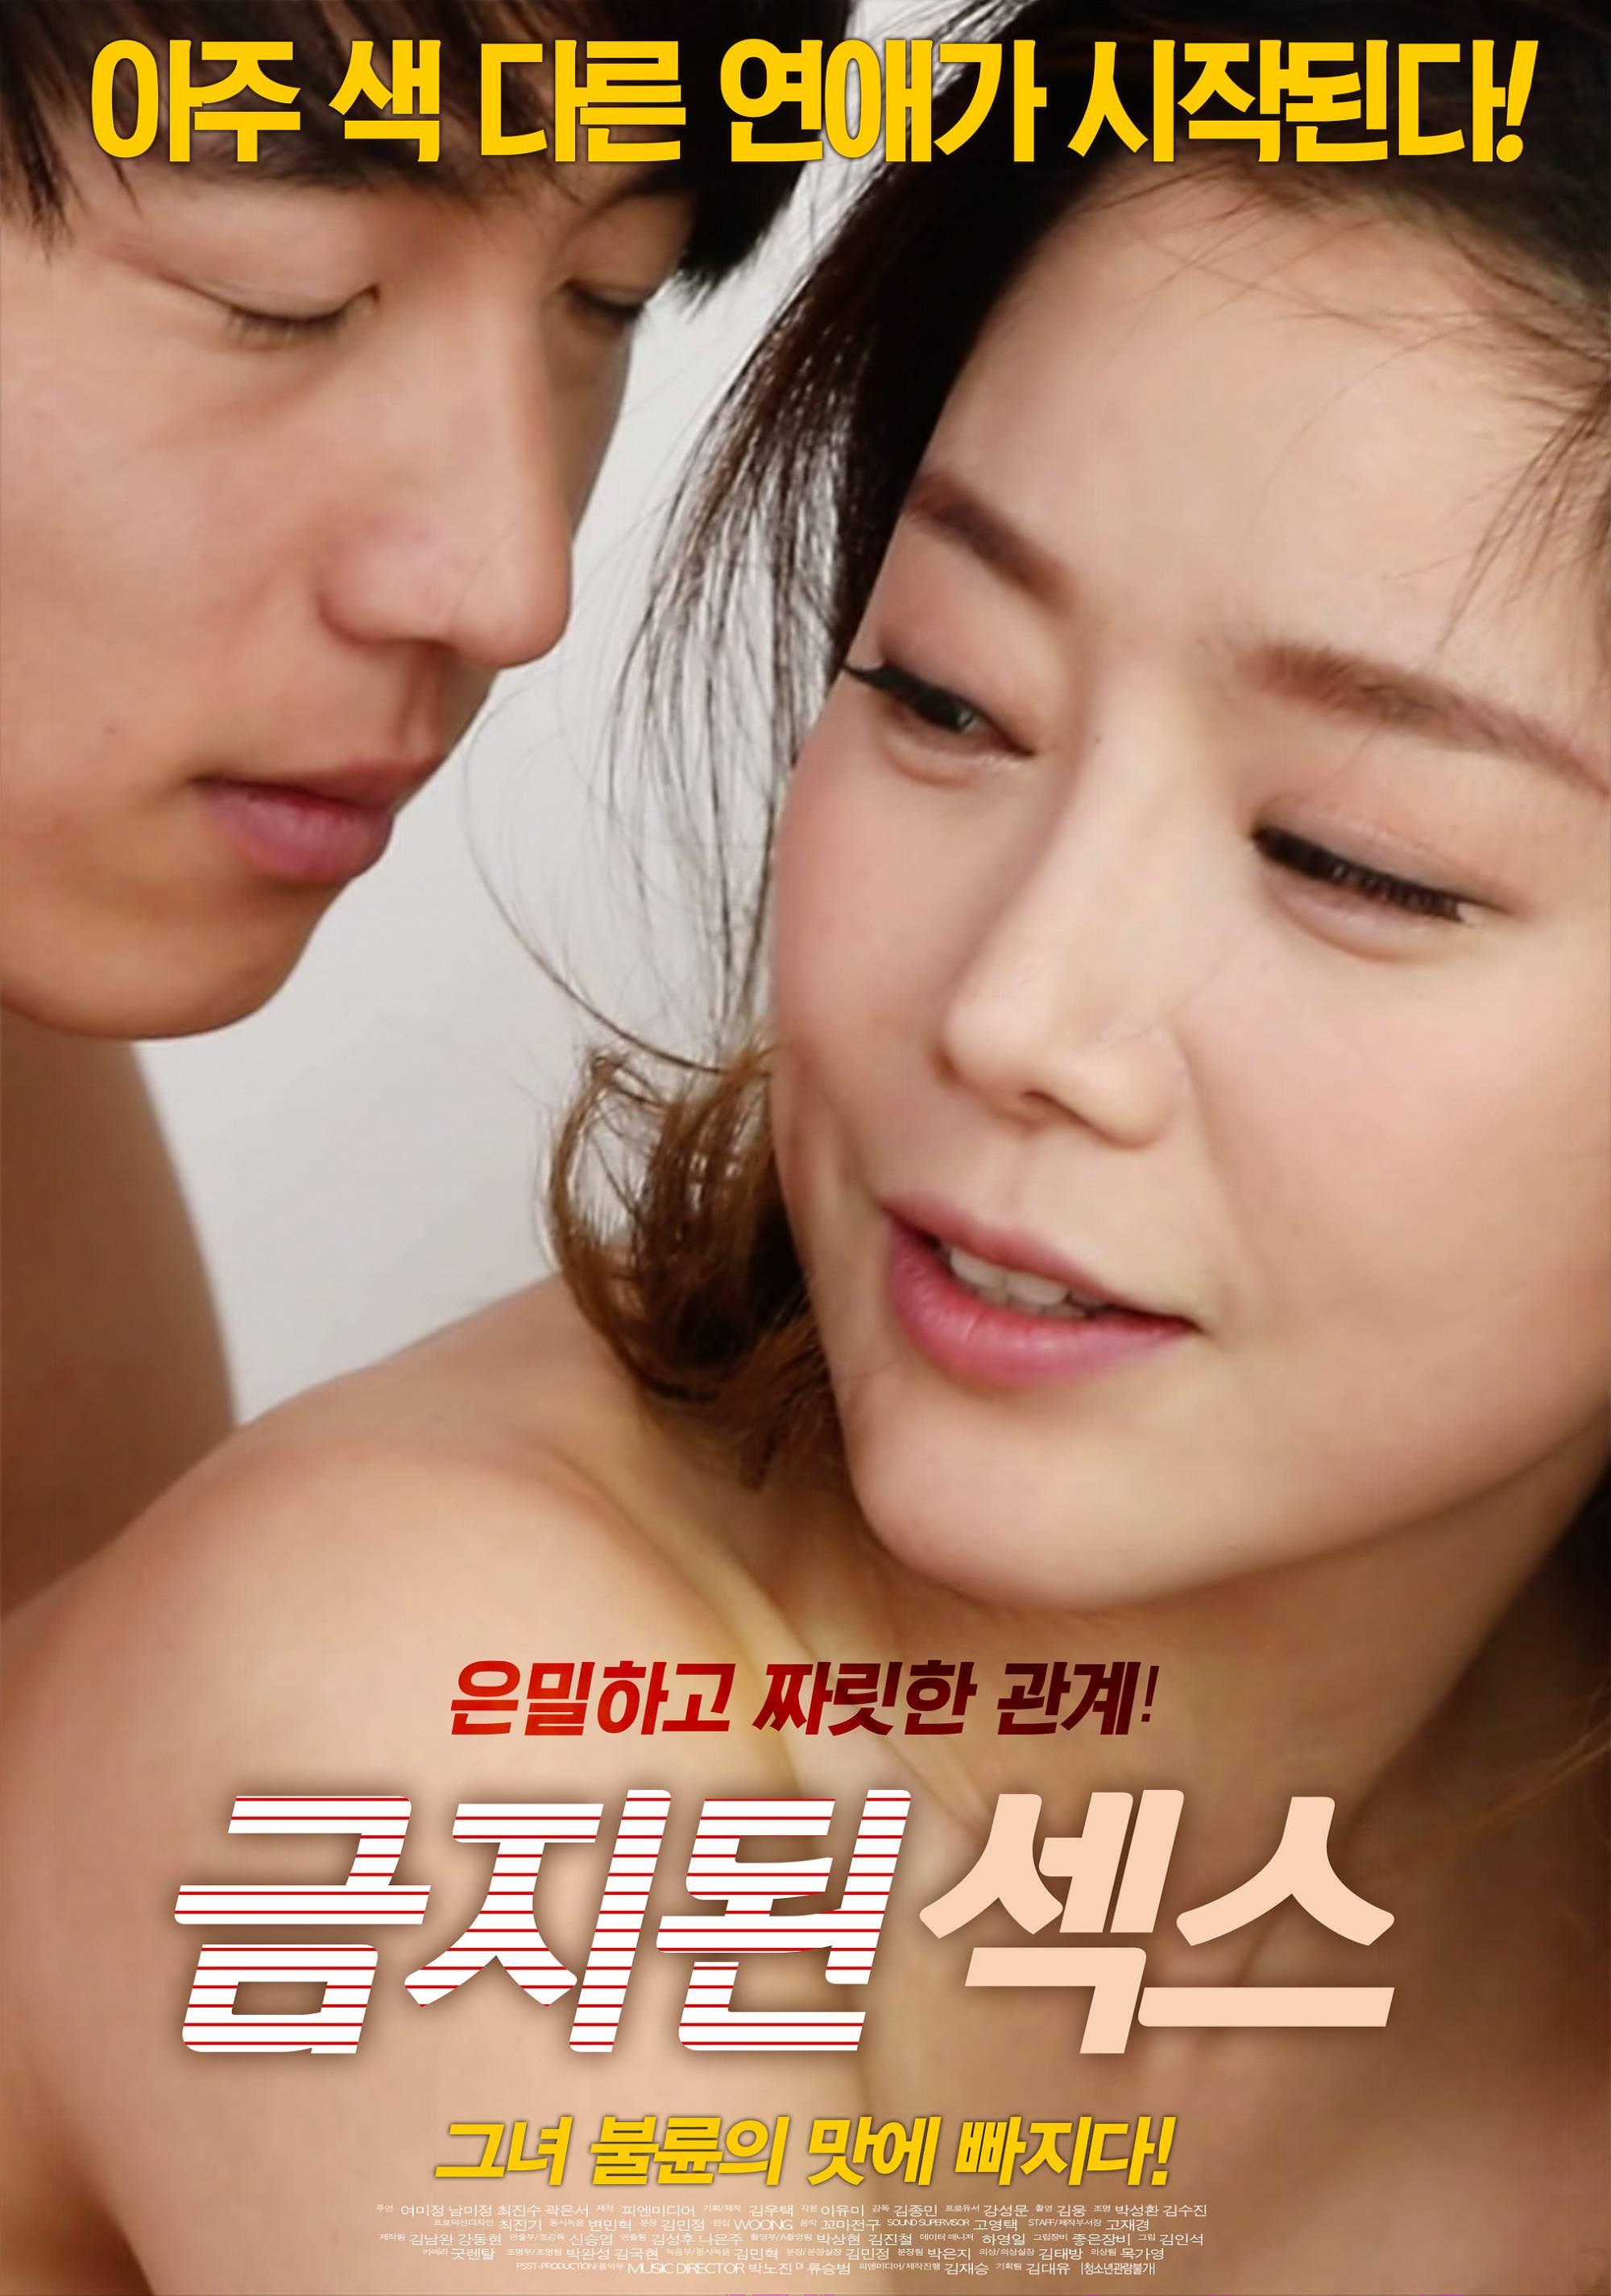 Korean model movie sex